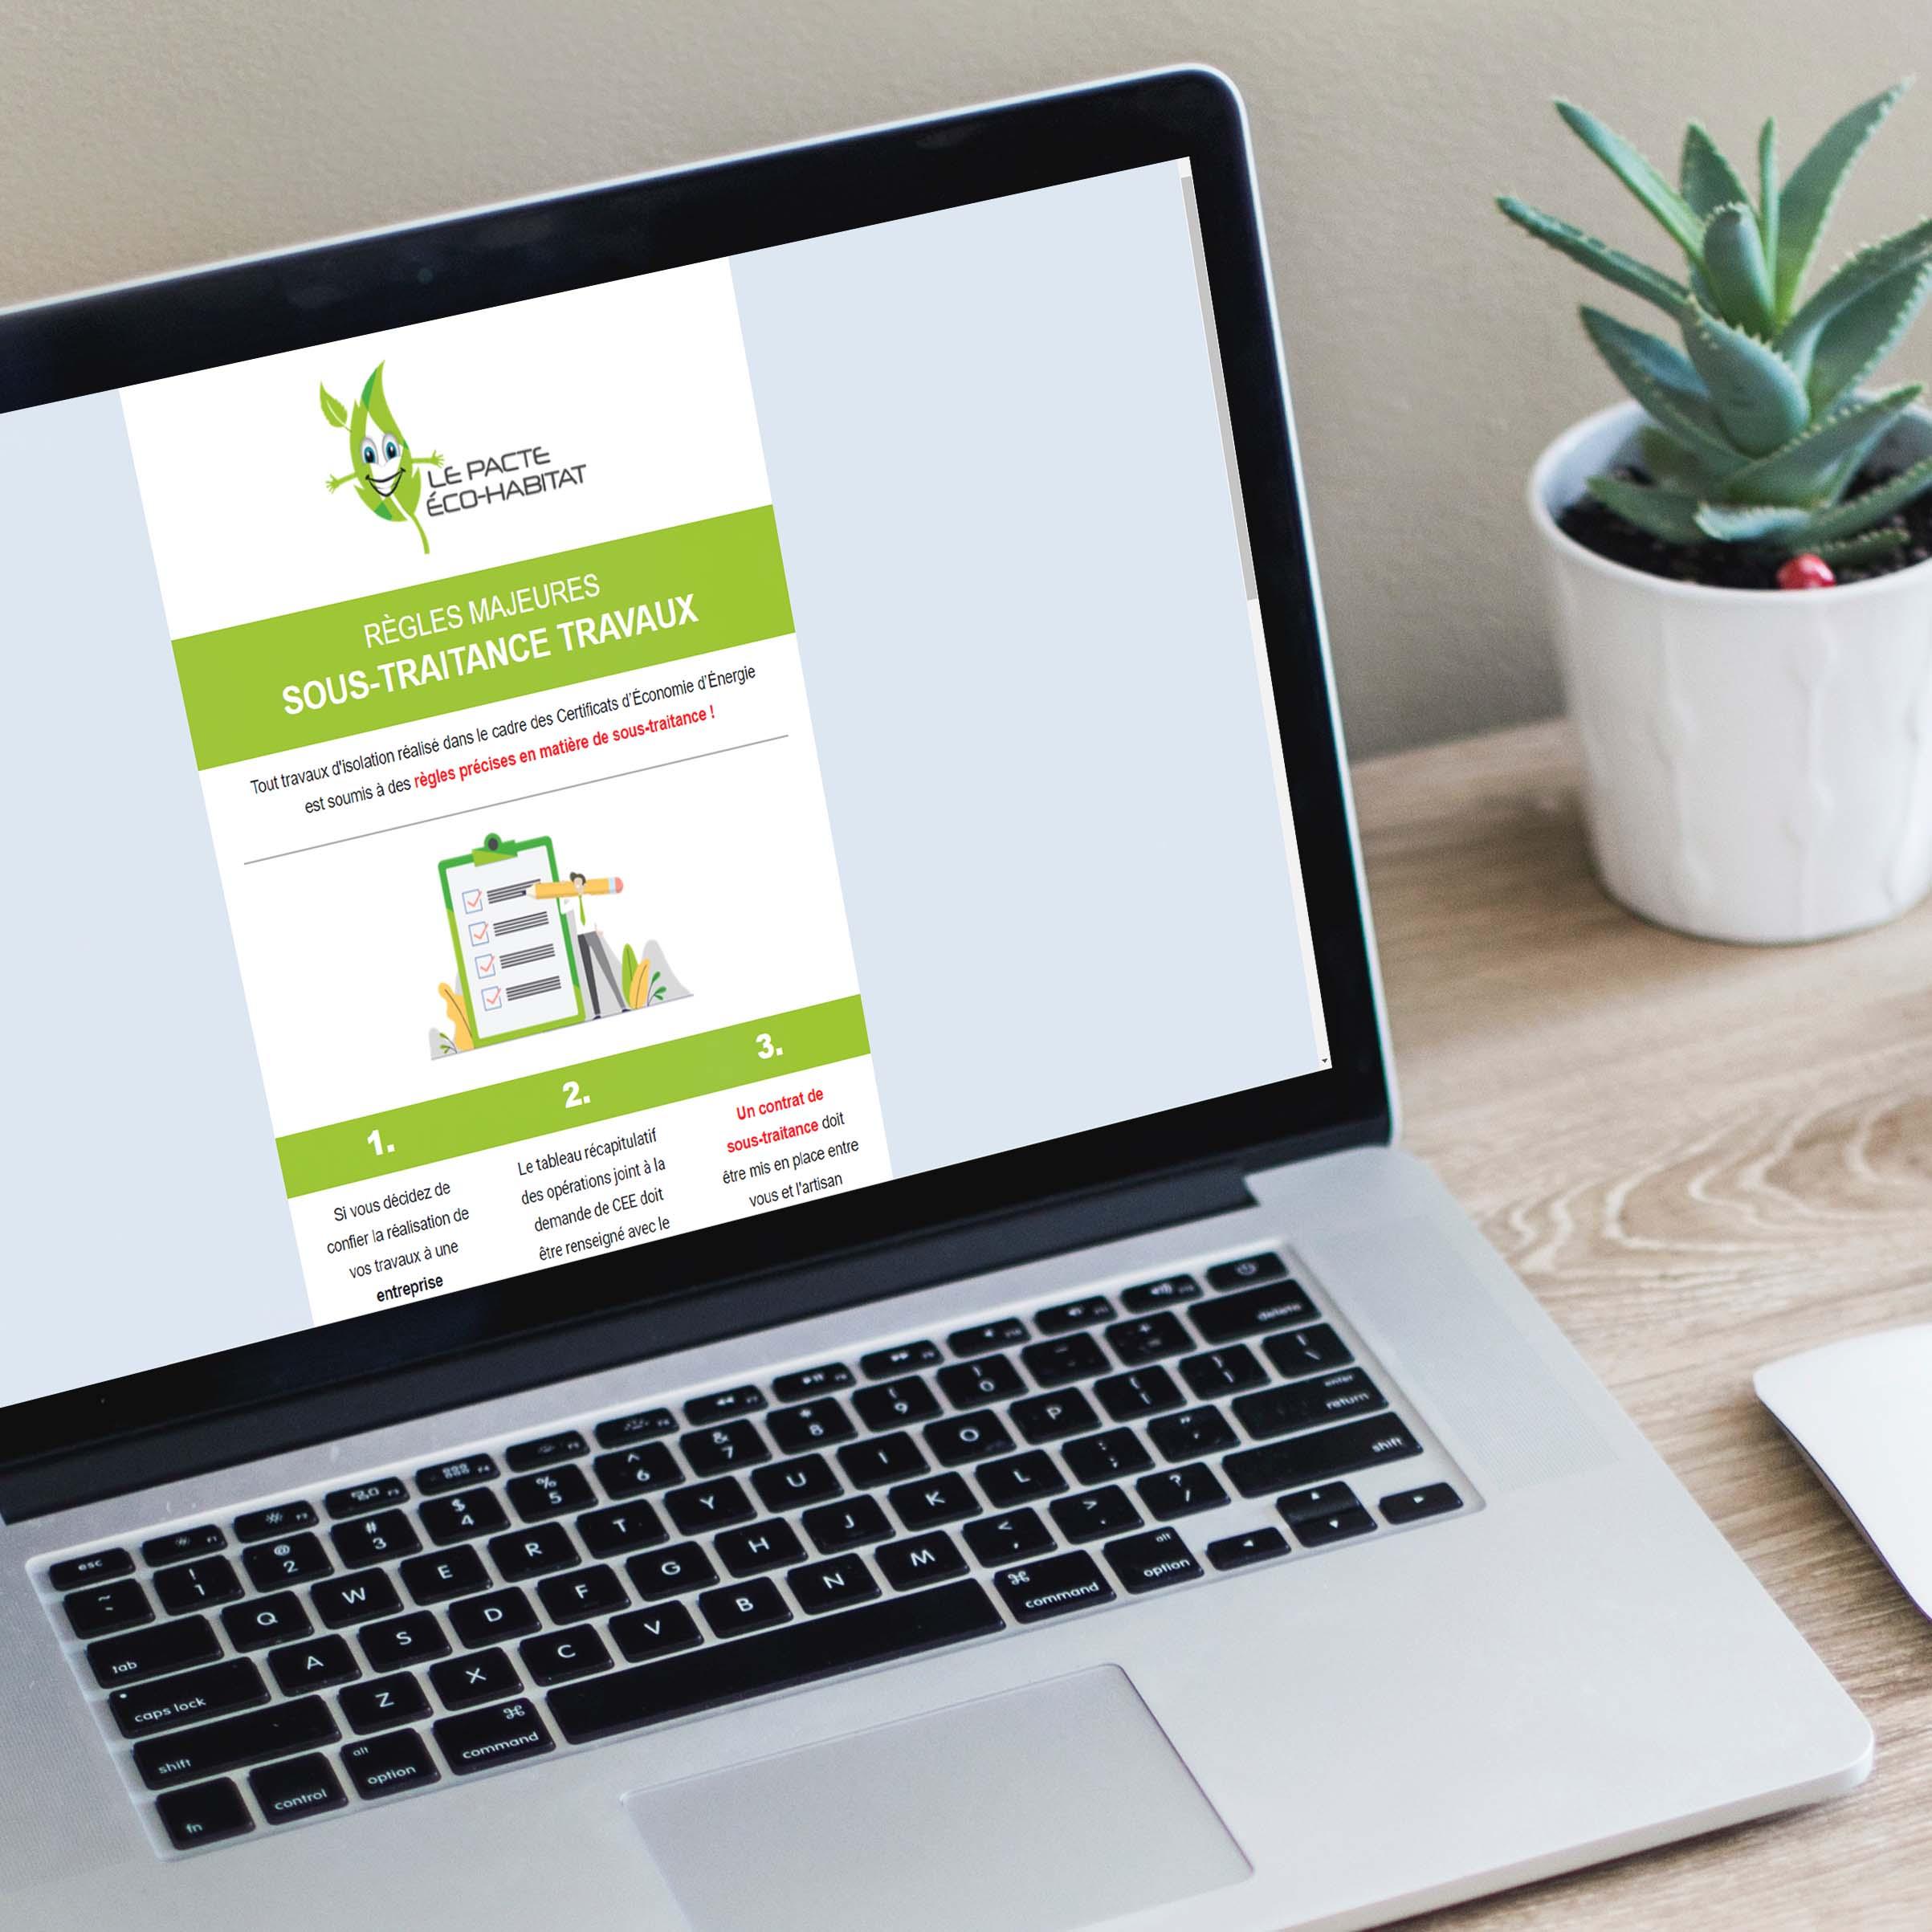 Fidélisation - Emailing Le Pacte Eco Habitat - Delphine PENGUILLY - agence marketing digital Nantes